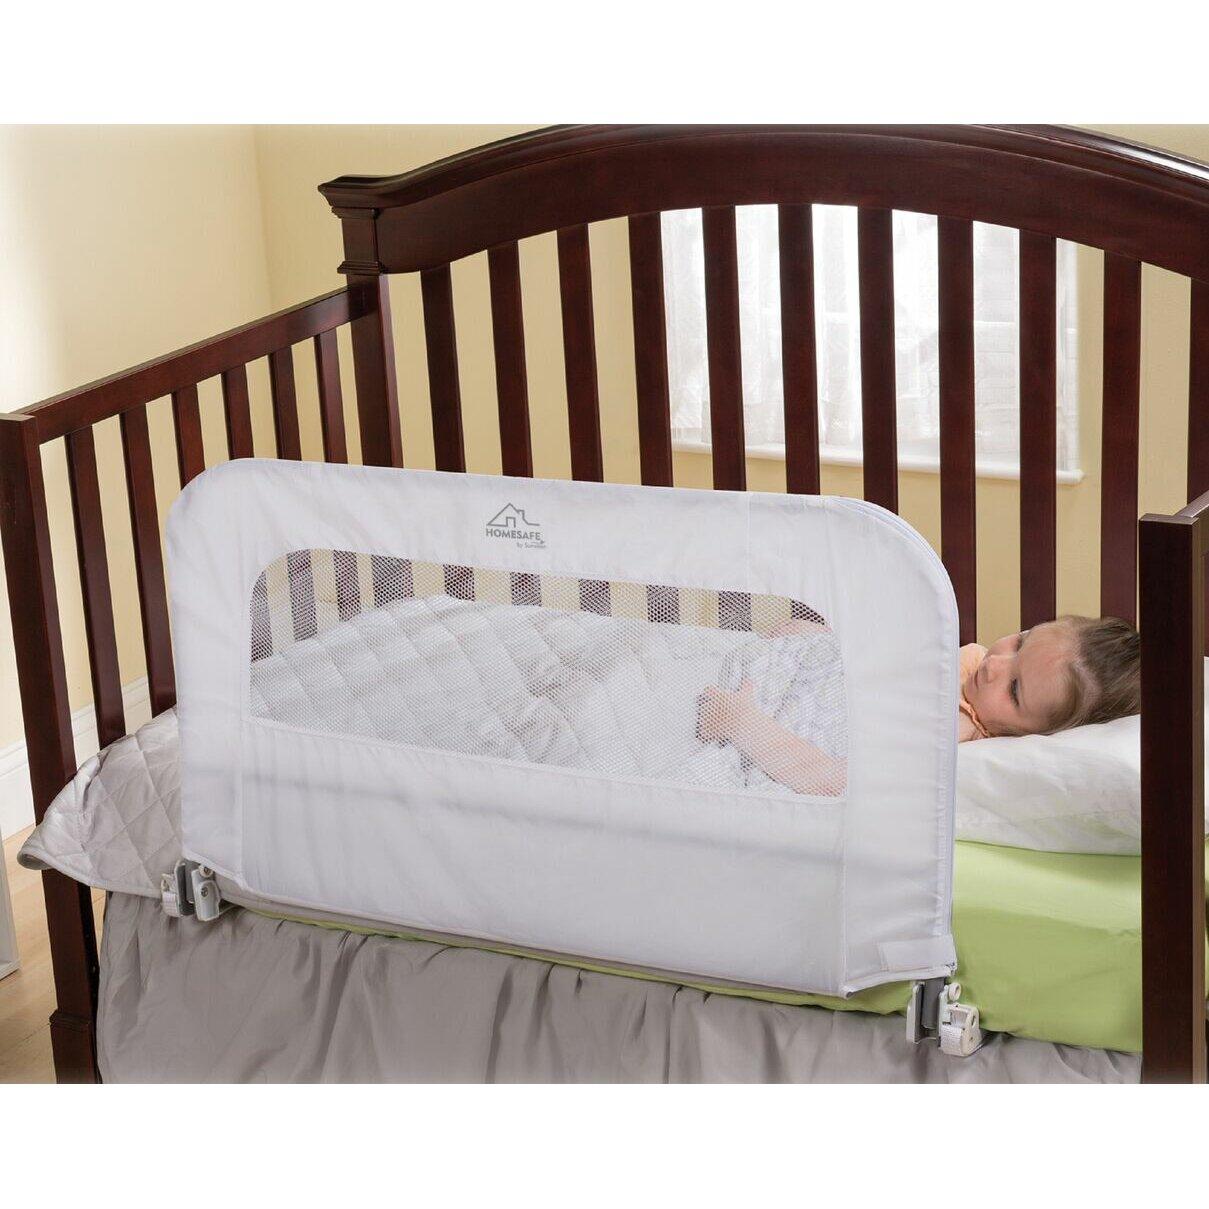 Baby bed rails - Summer Infant Home Safe Mesh Safety Rail